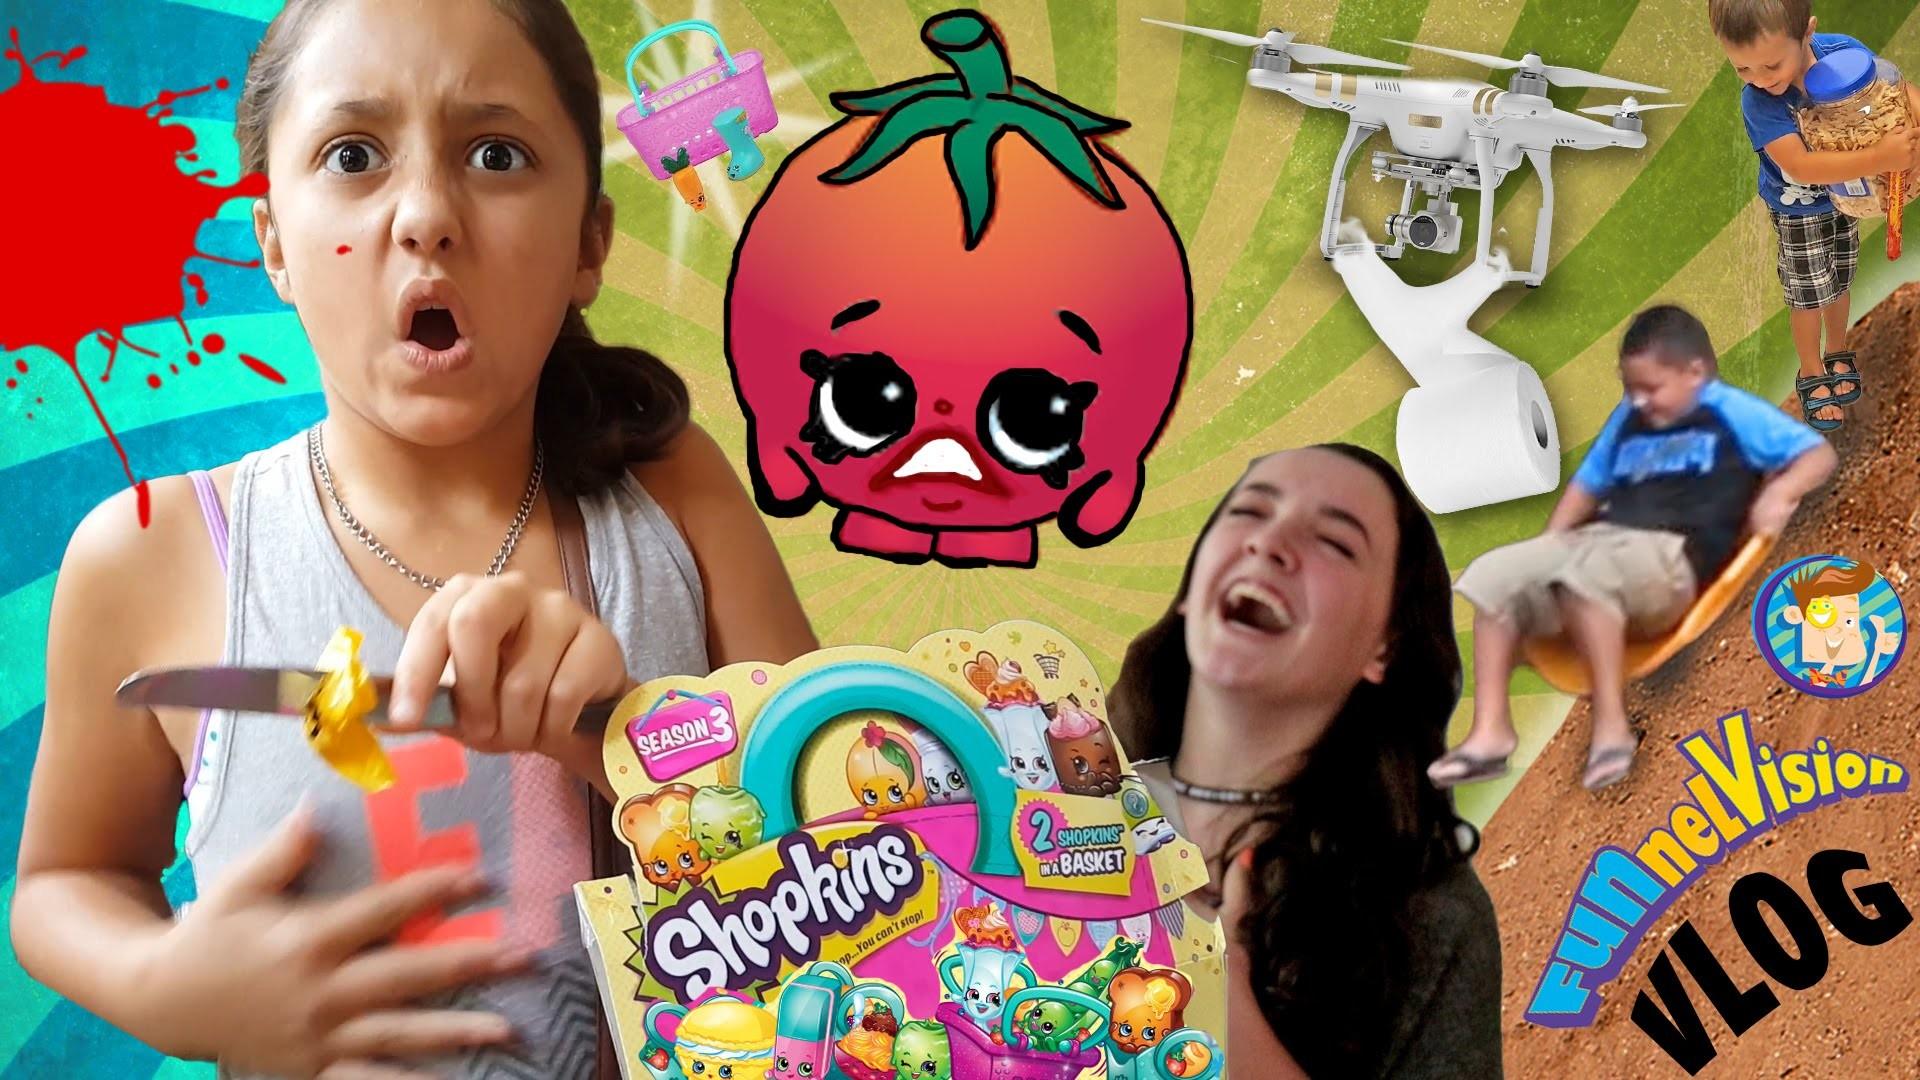 Bloody Shopkins | Toilet Paper Mess | Dirt Sledding & Our BROKEN Drone! (FUNnel Vision Family Vlog)